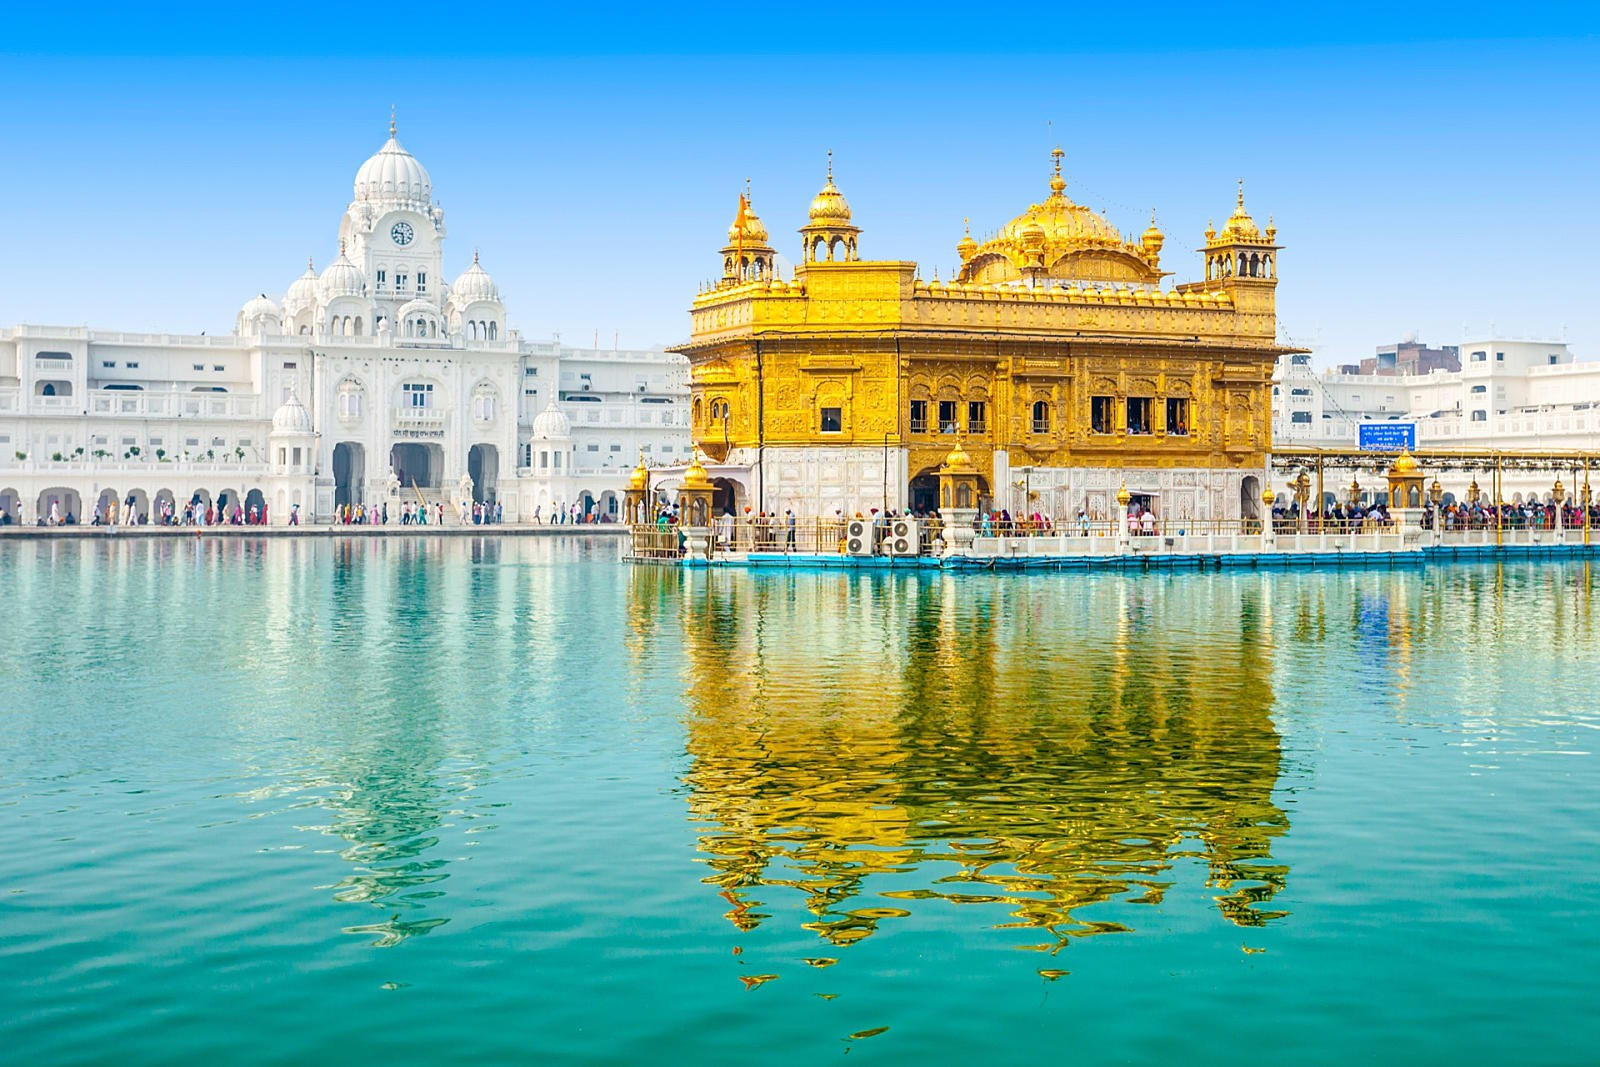 chandigarh taxi service amritsar golden temple tours.jpg